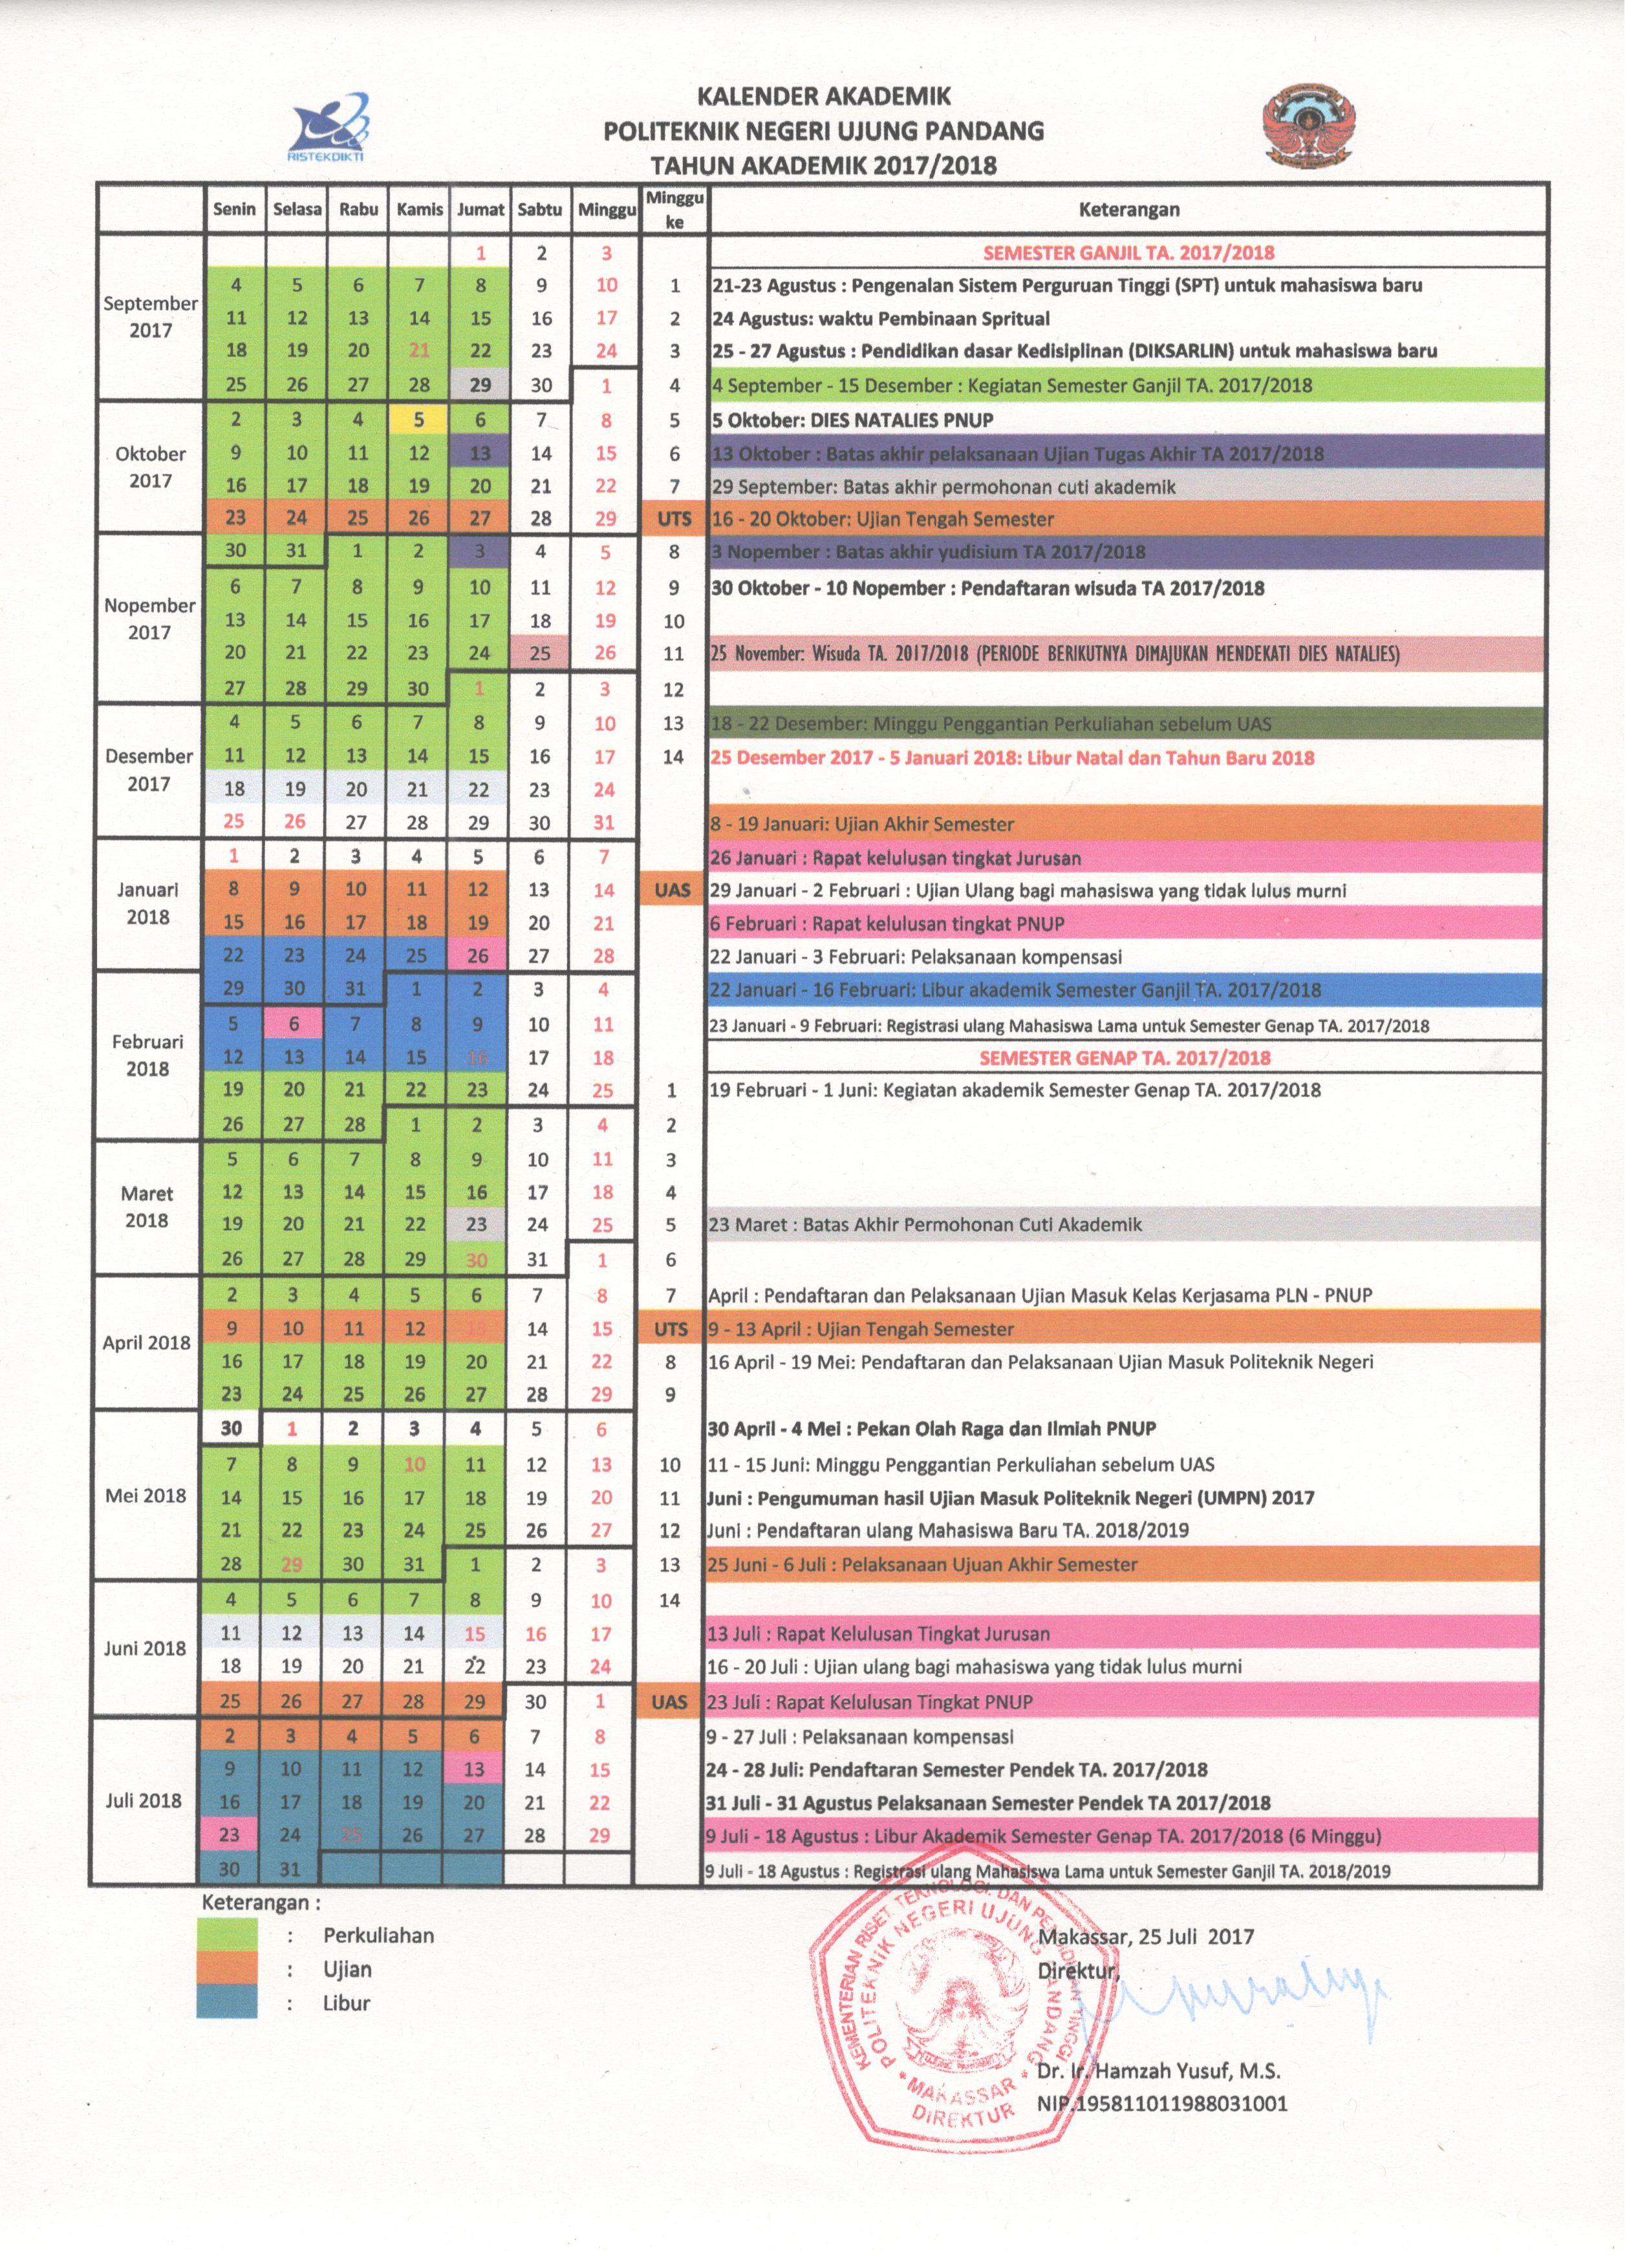 Kalender Akademik Tahun Ajaran 2017/2018 Politeknik Negeri Ujung Pandang